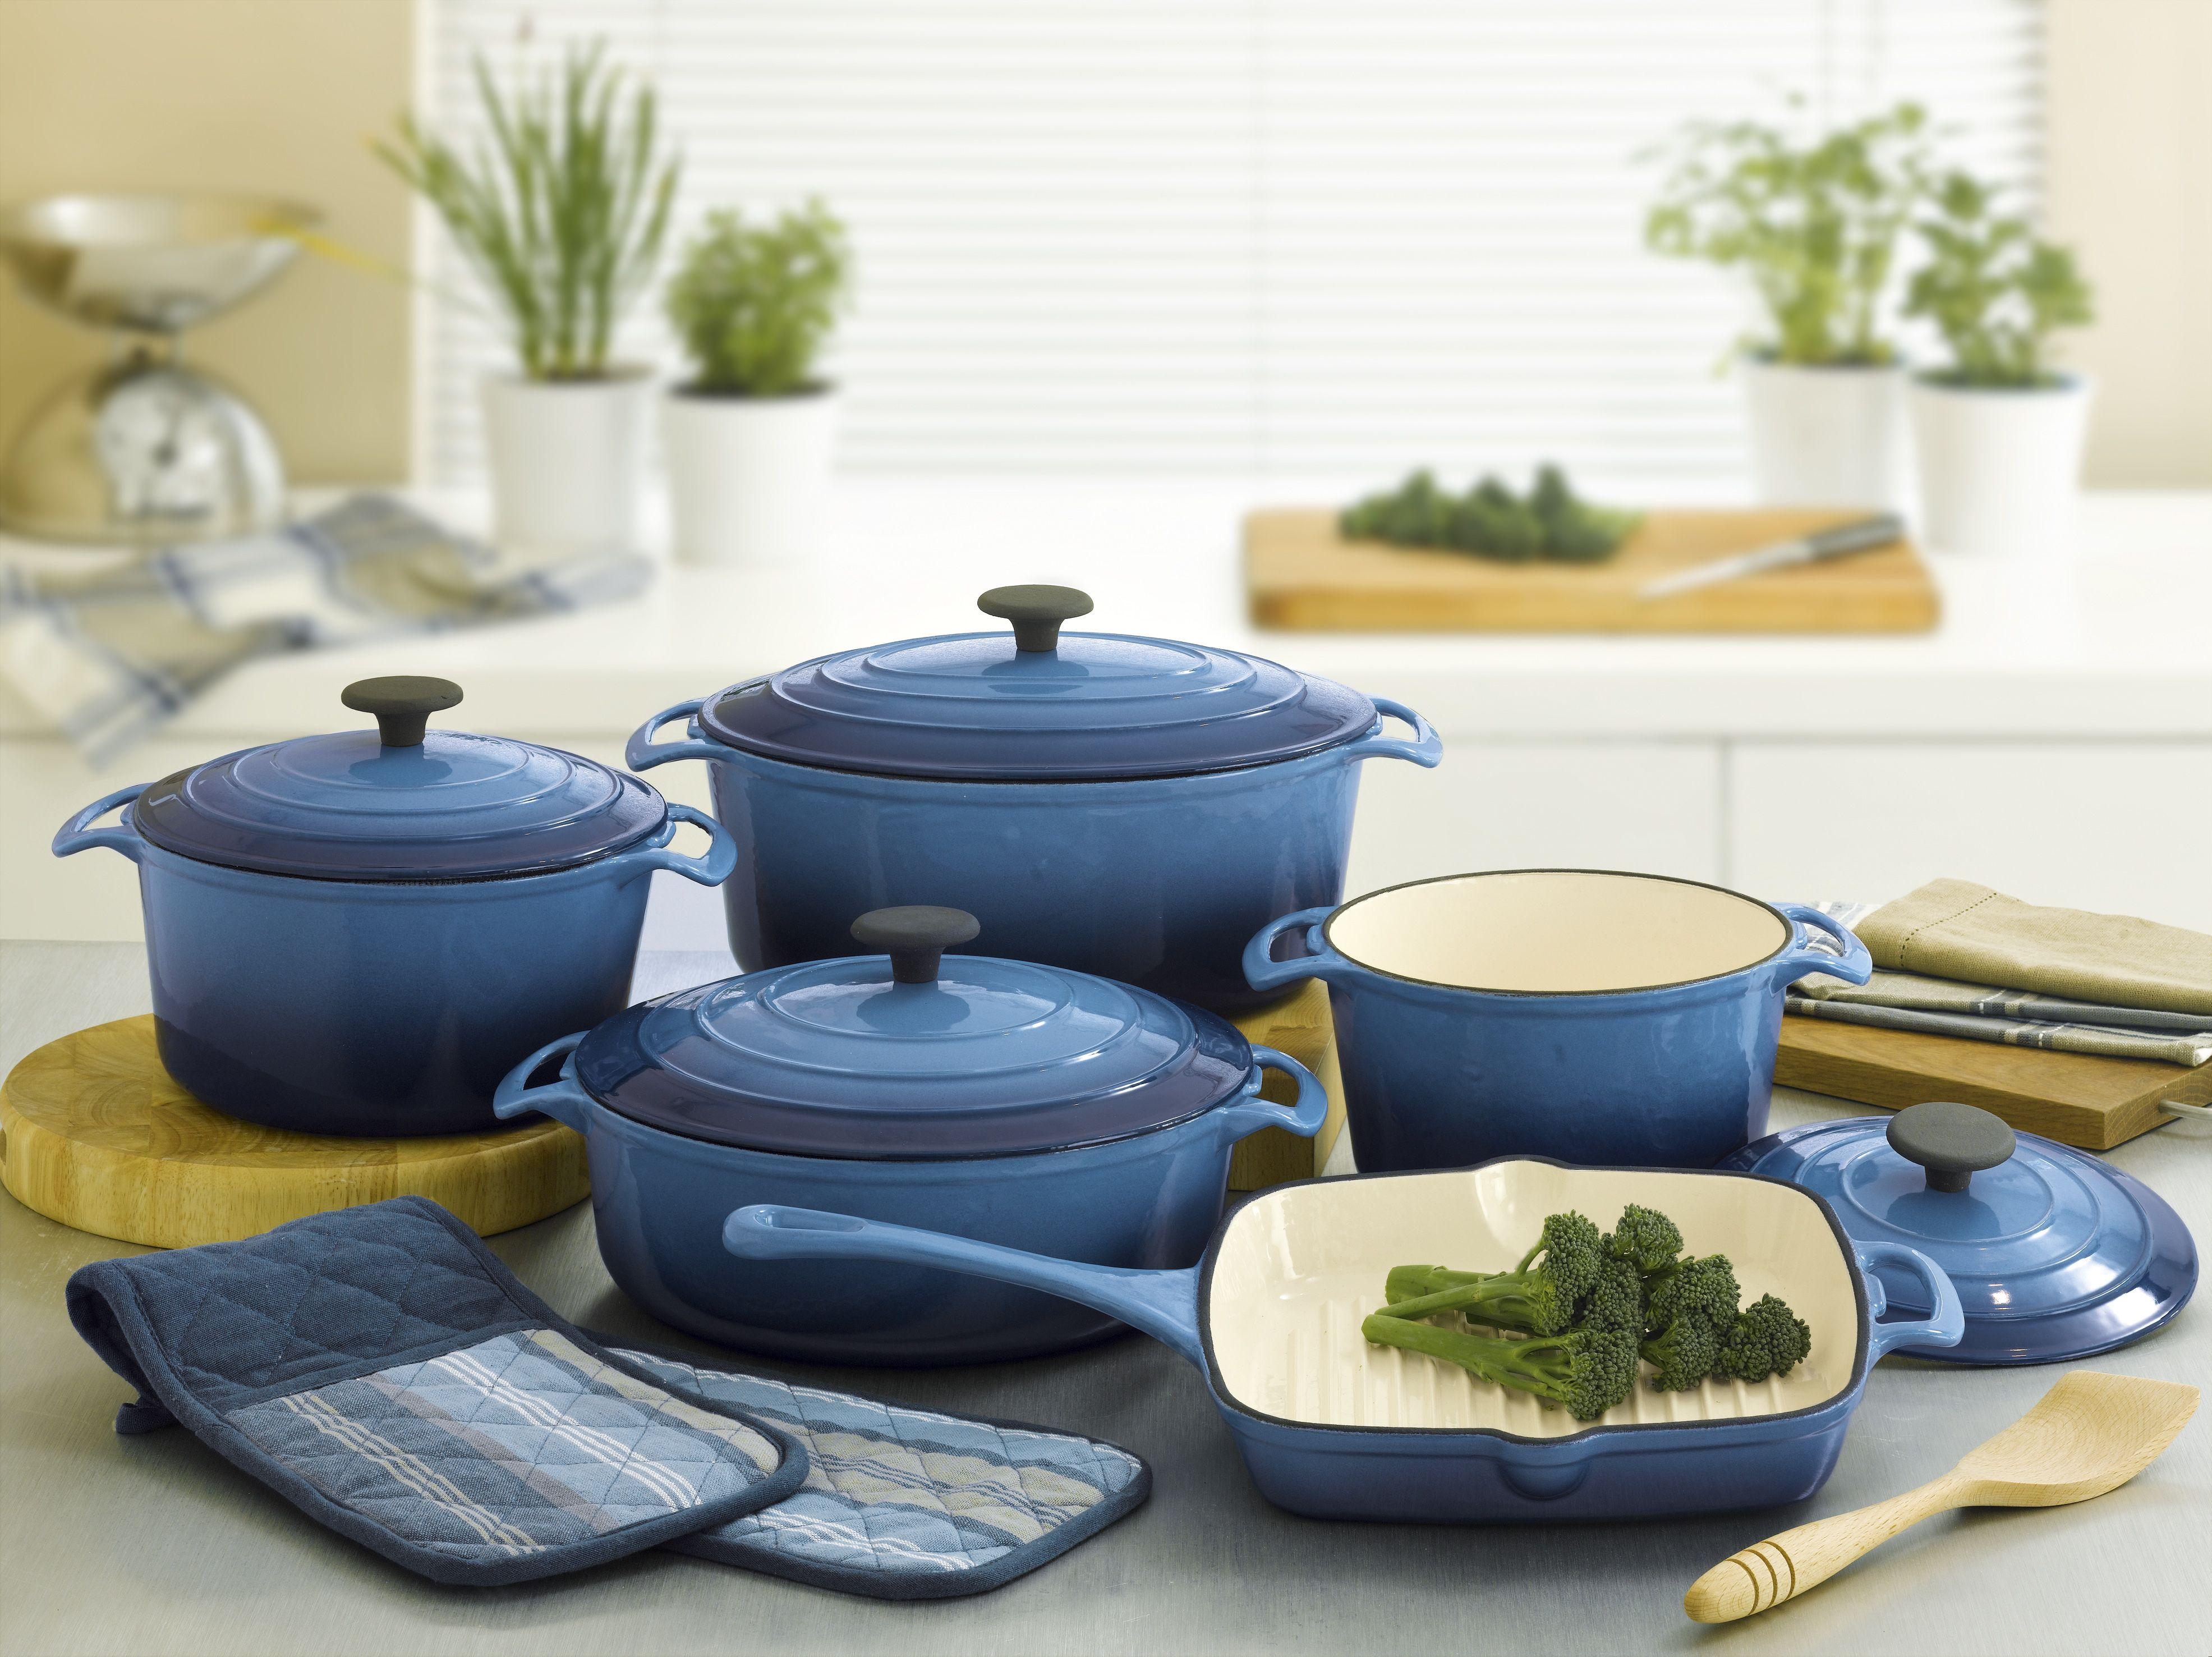 HomeChoice Premier set | Kitchen Gadgets | Pinterest | Household ...